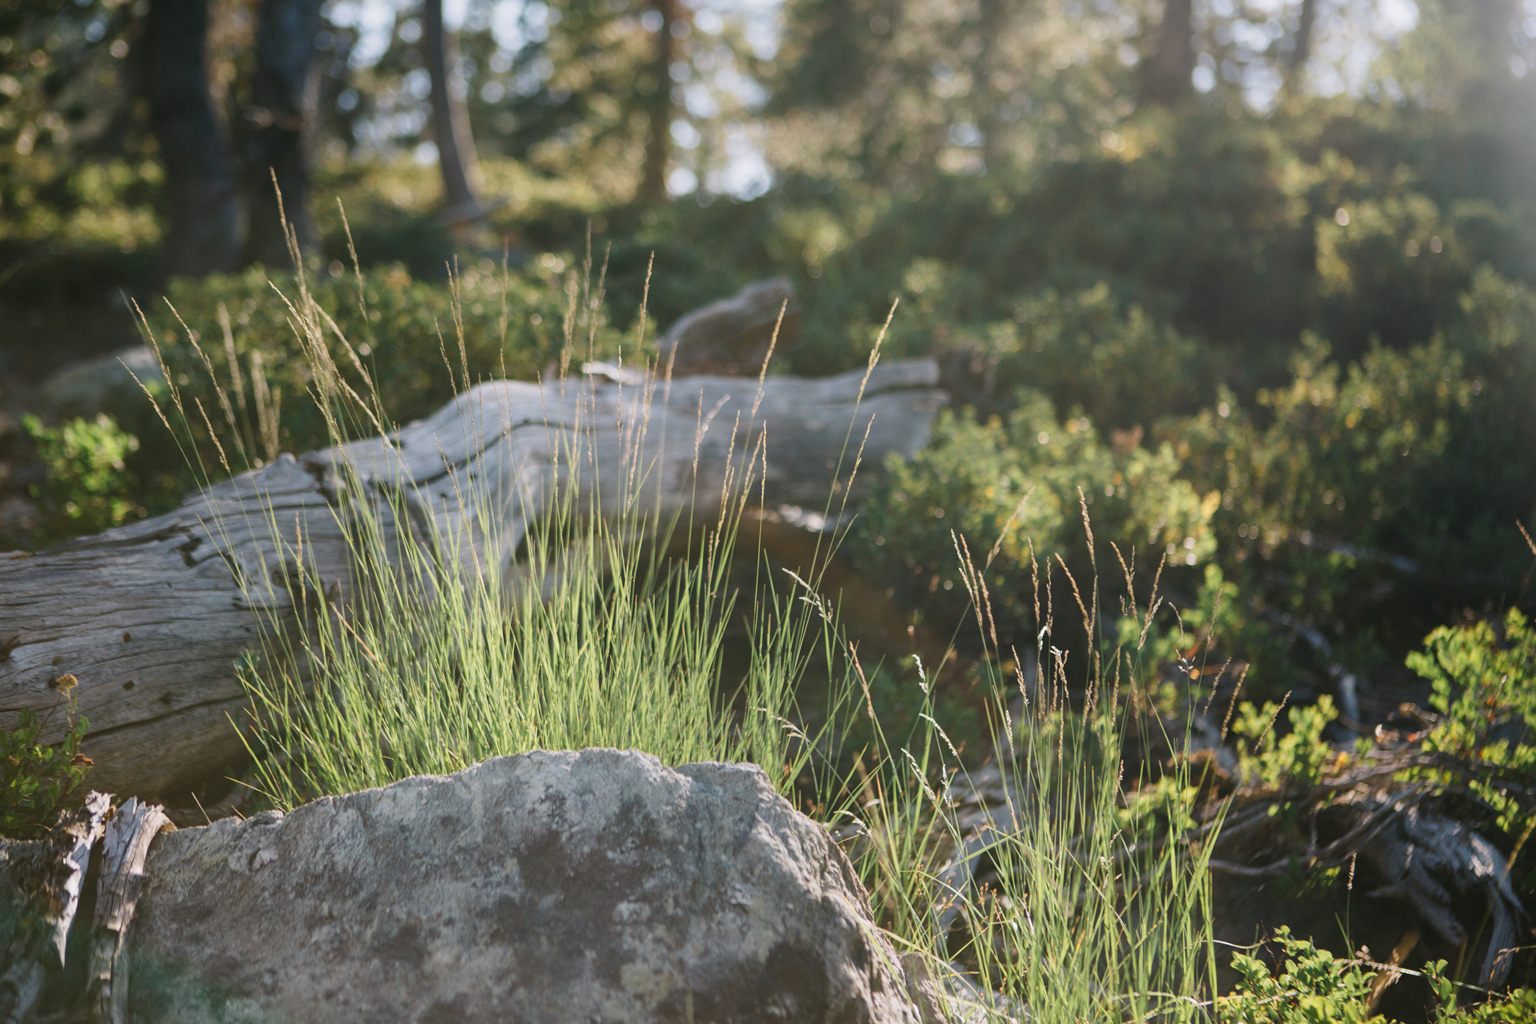 CindyGiovagnoli_outdoors_photographer_Sierra_Buttes_firetower_watchtower_Sardine_Snag_Bear_lake_hike_swim_camp-064.jpg